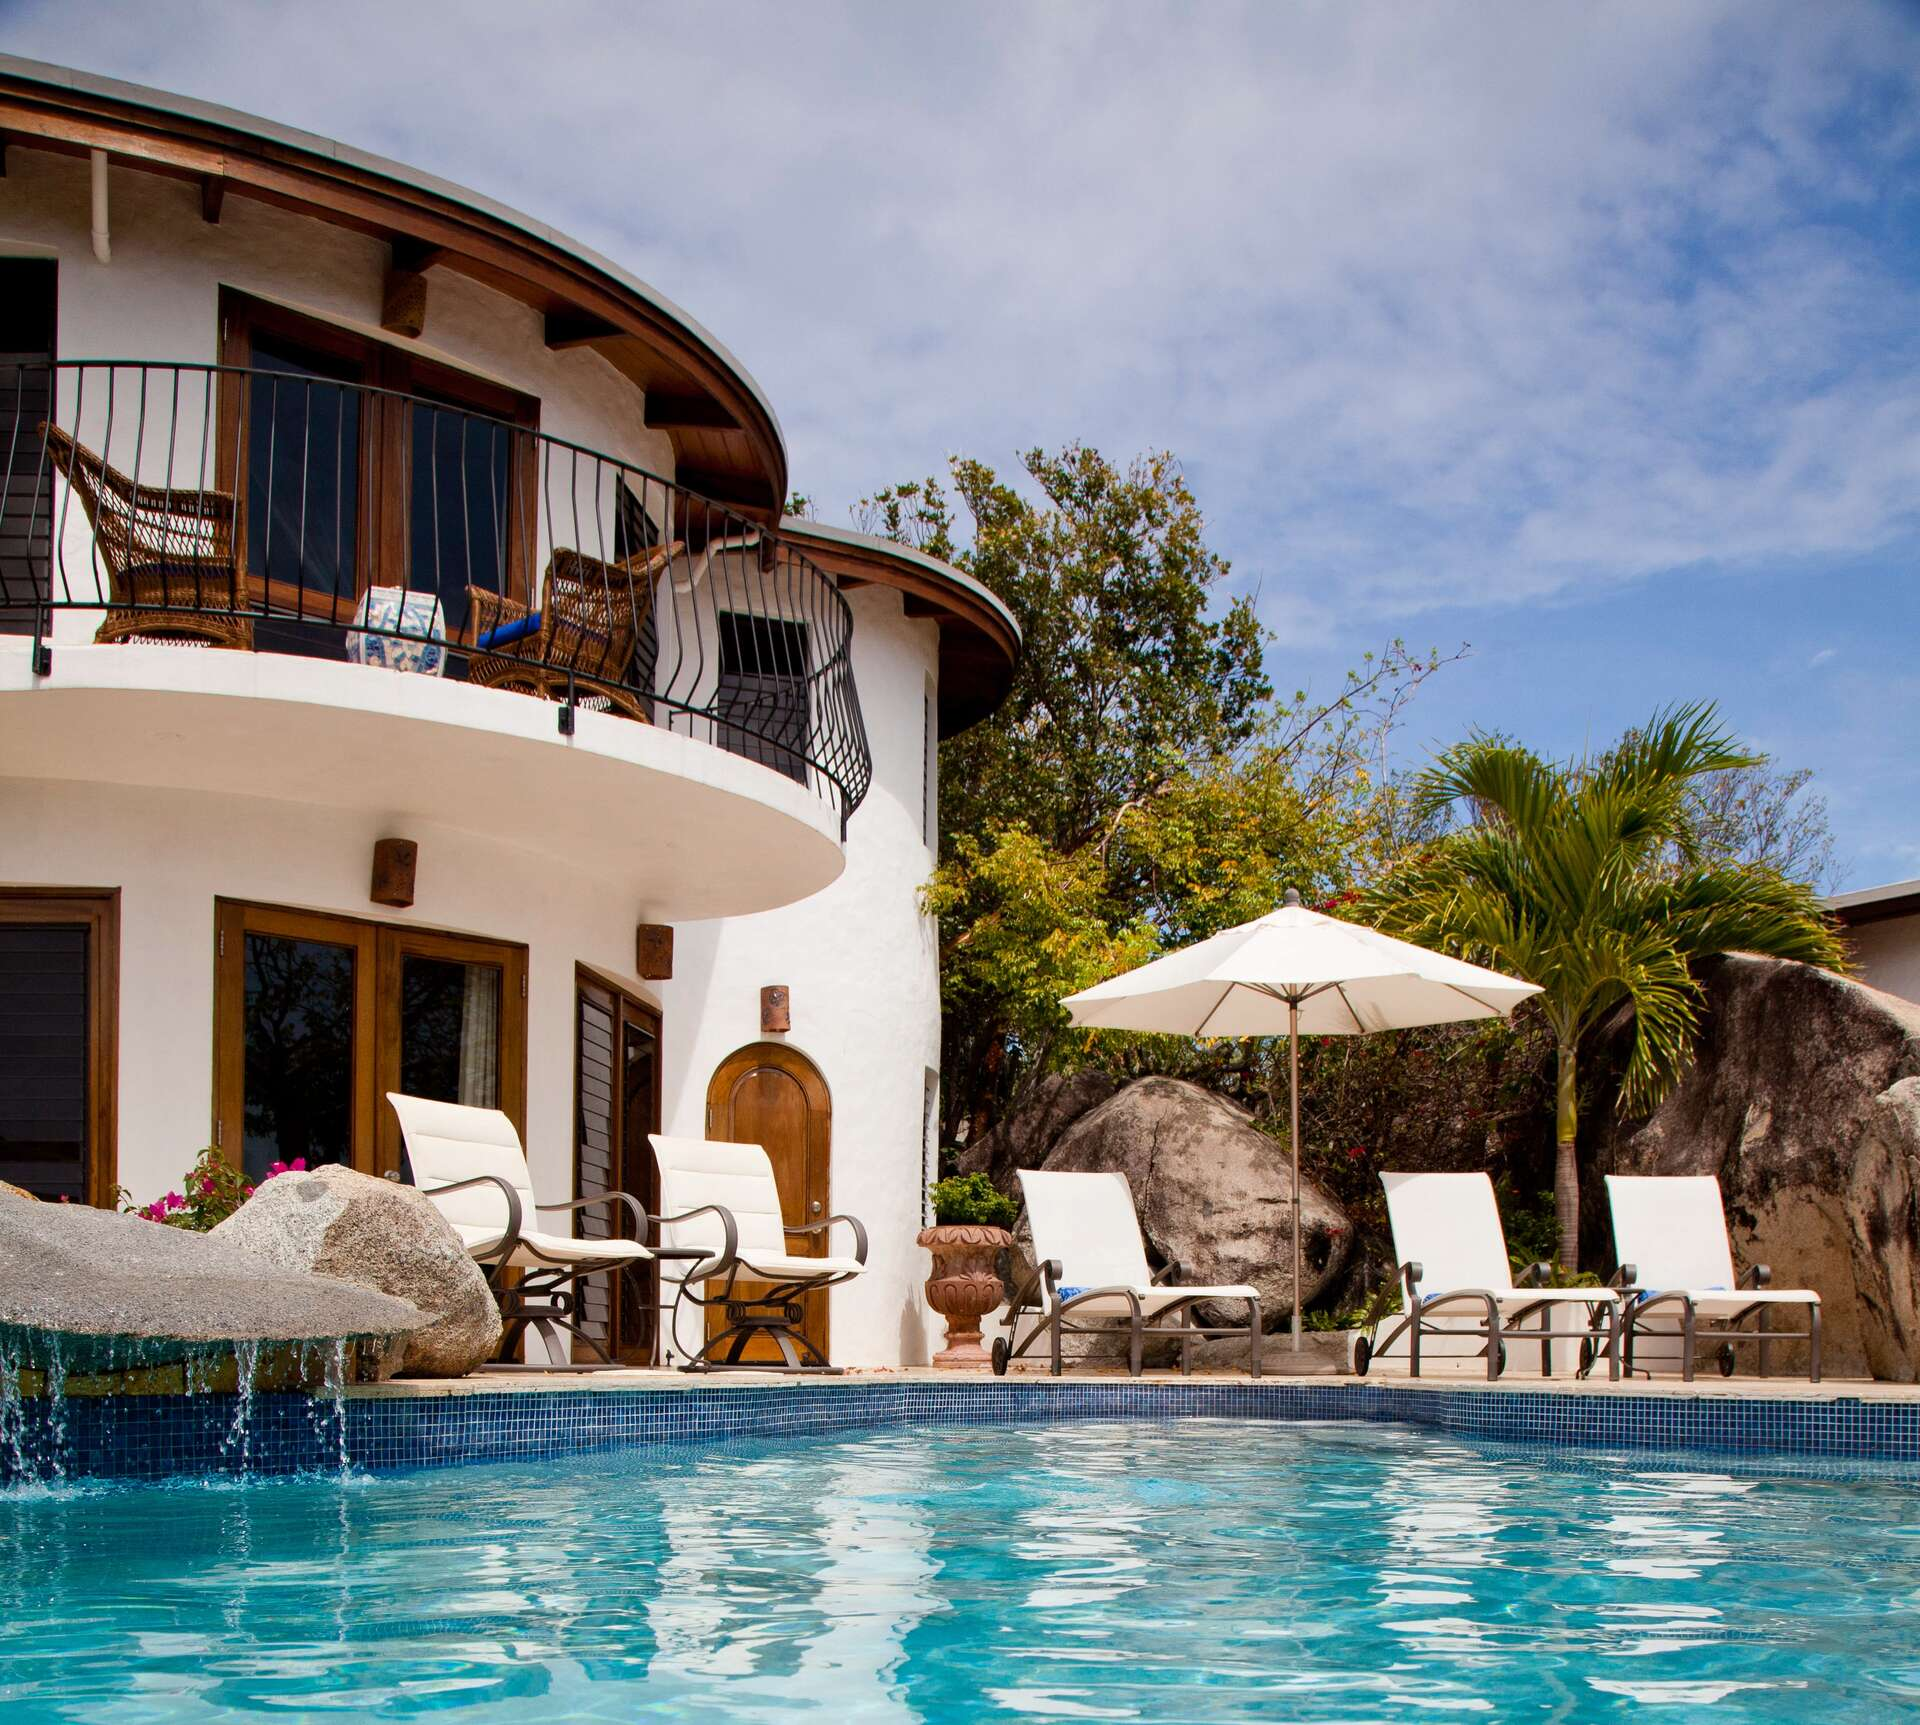 Luxury villa rentals caribbean - British virgin islands - Virgin gorda - Little trunk bay - On the Rocks Villa - Image 1/16